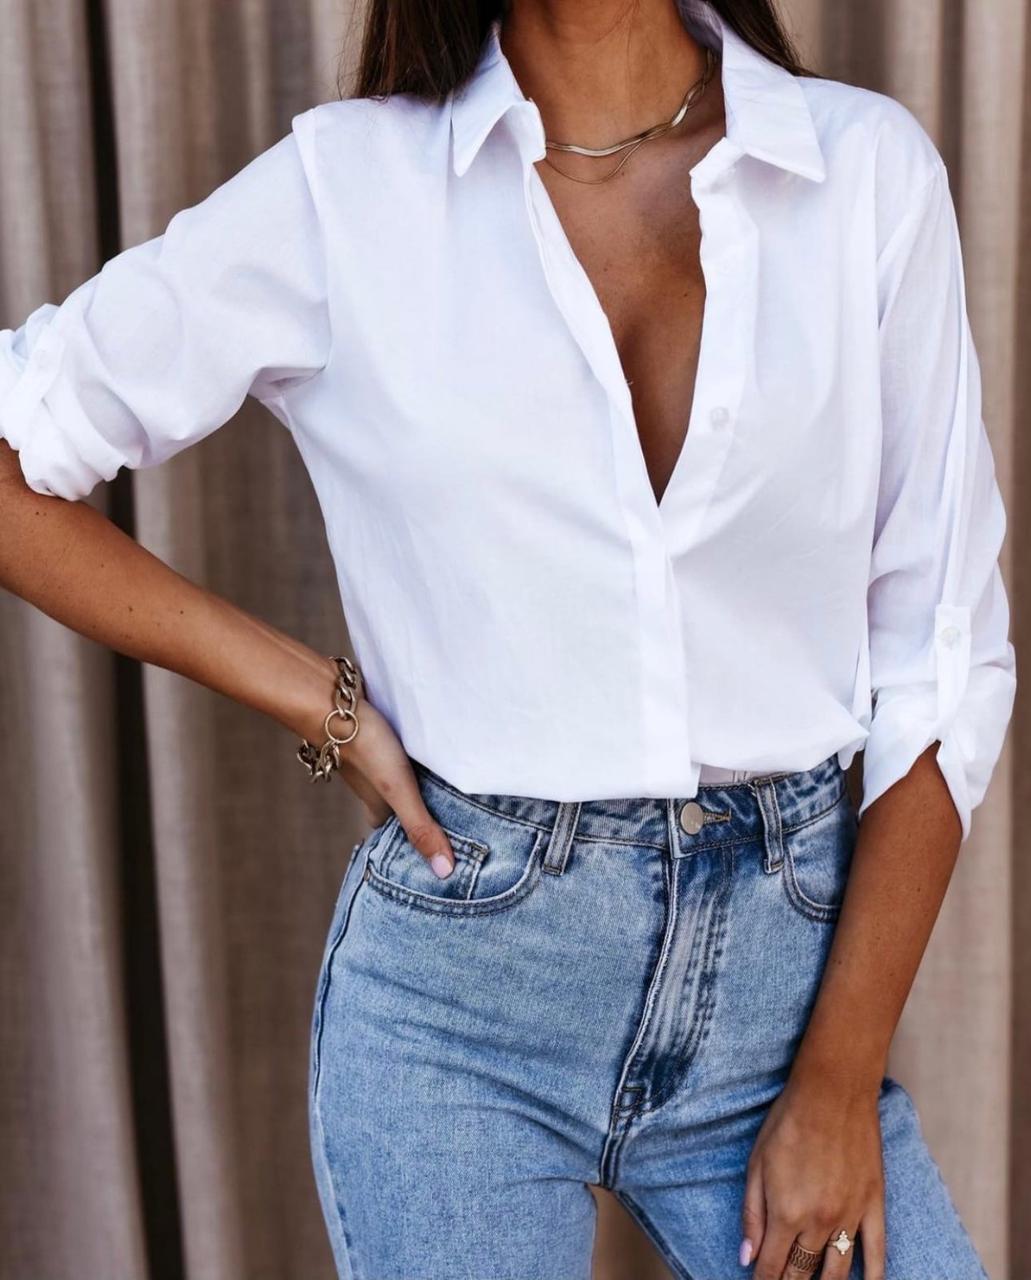 Женская весенняя рубашка  новинка 2021